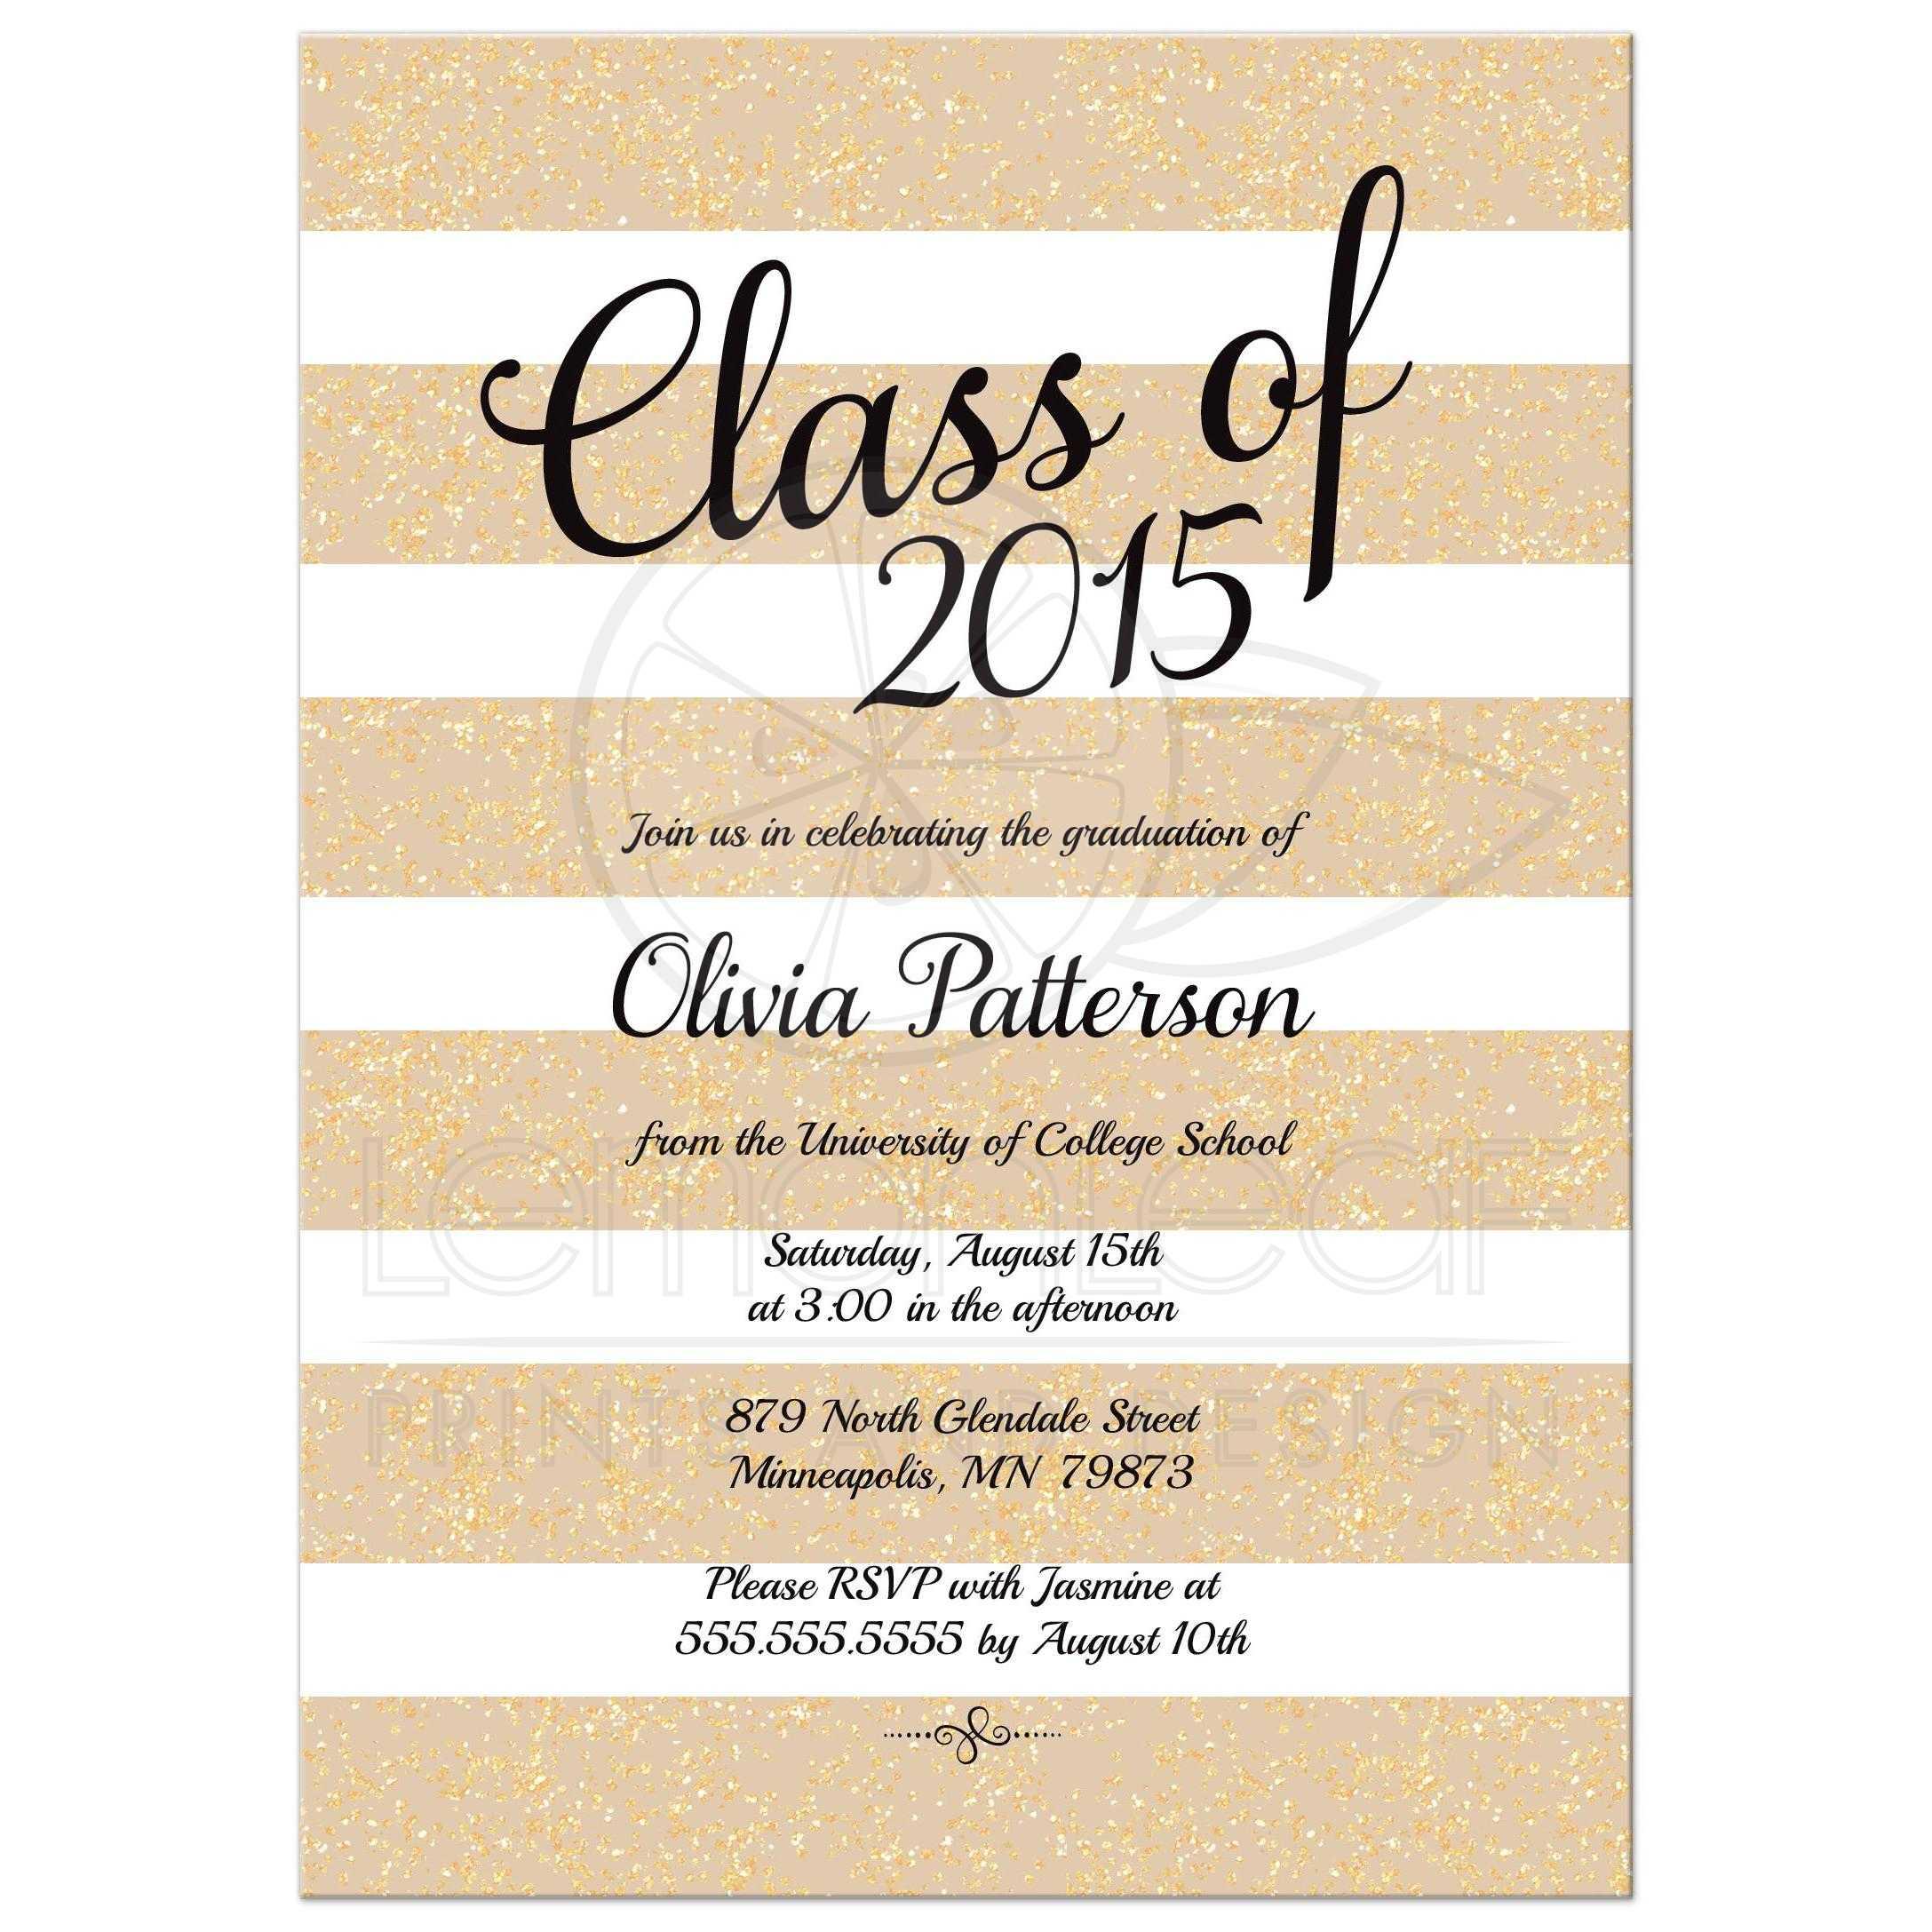 Graduation announcement nude taupe glitter stripes taupe nude and gold glitter graduation announcement filmwisefo